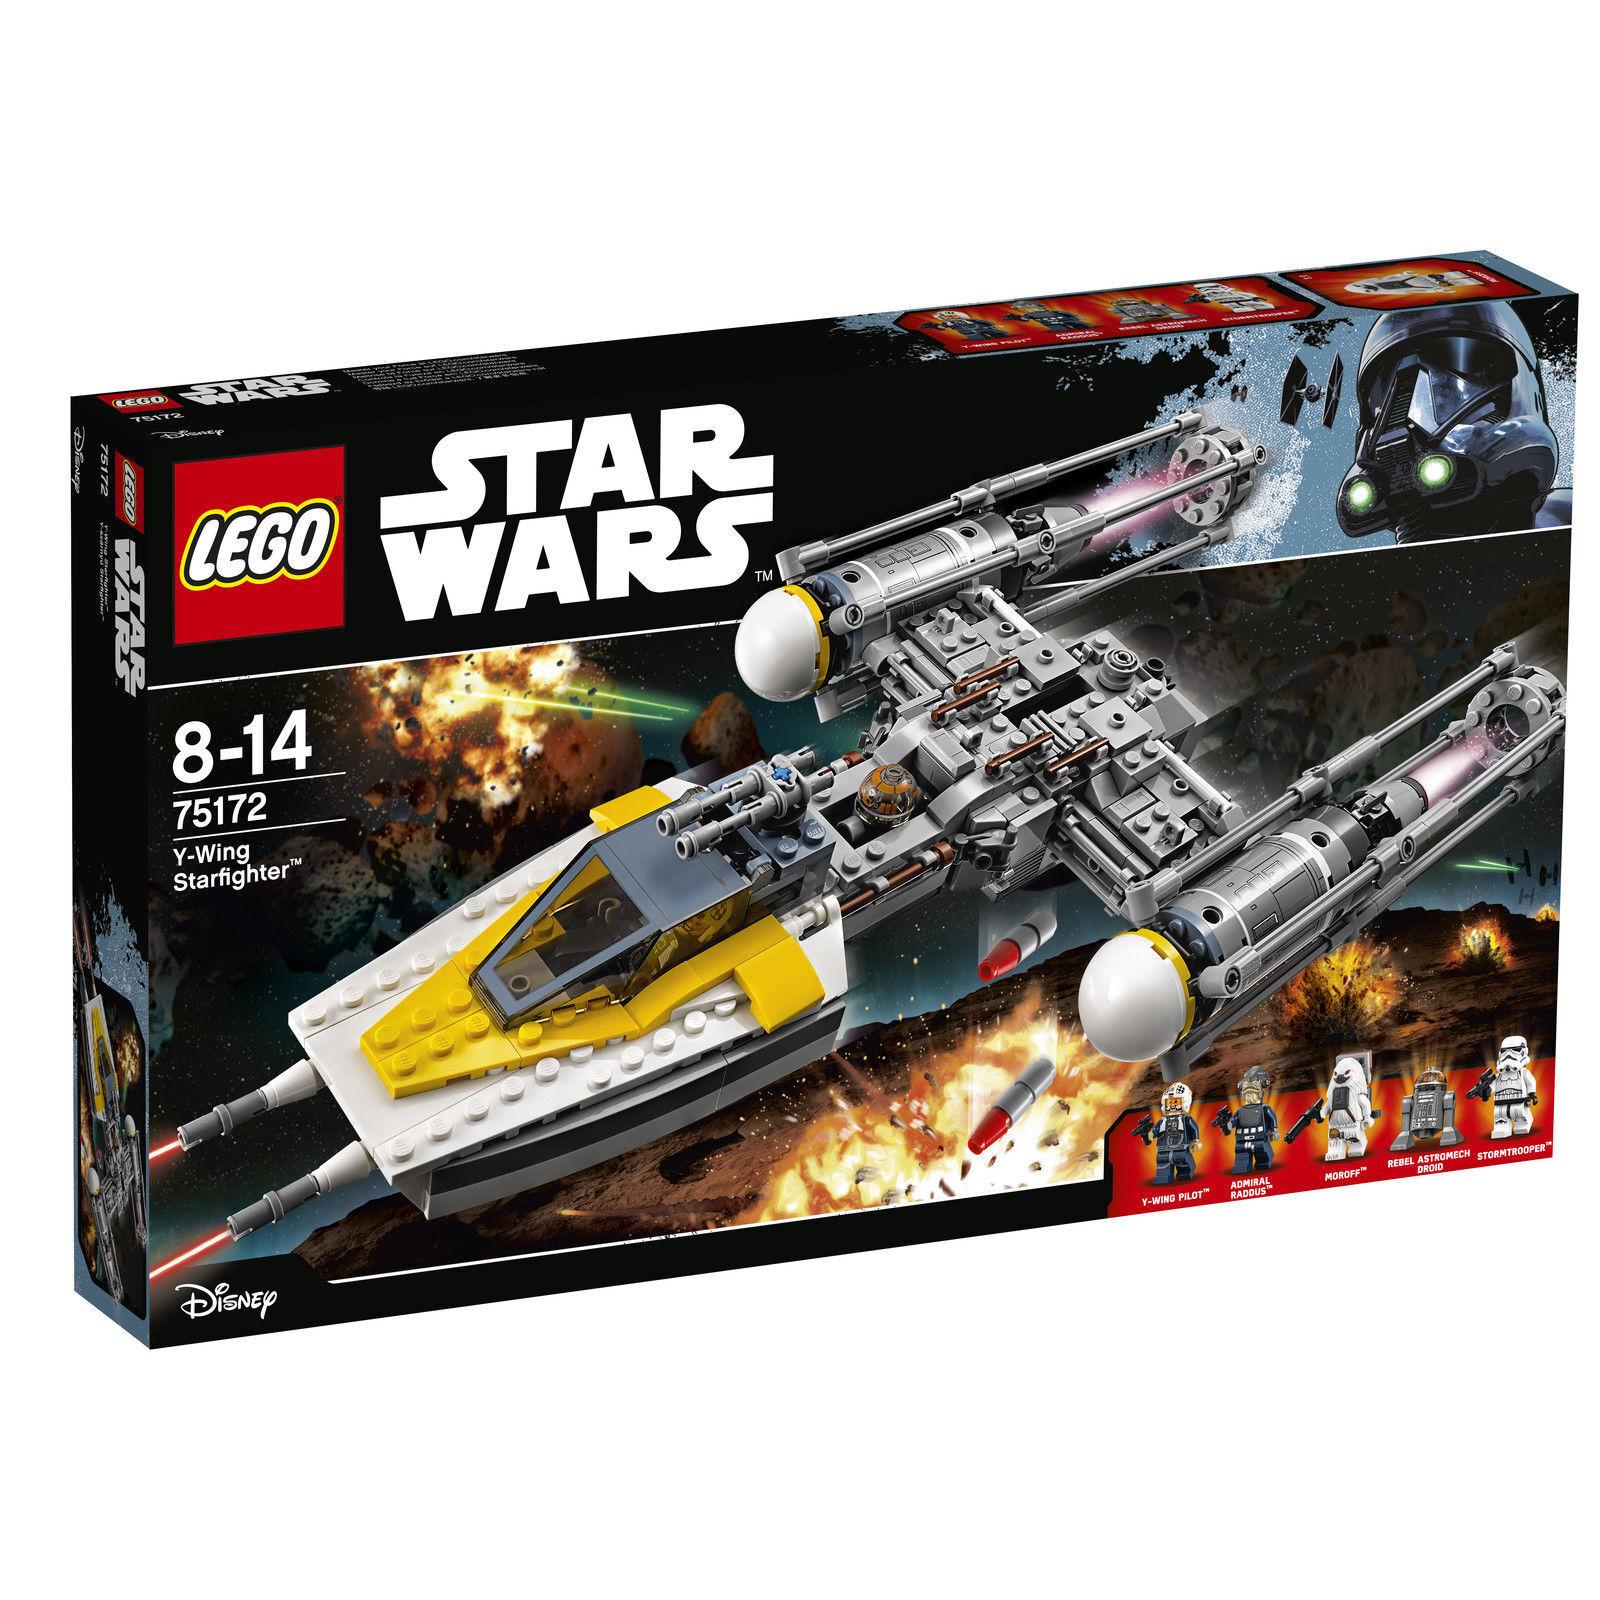 LEGO ® Star Wars Y-Wing Starfighter (75172) 2. choix 2. Choice